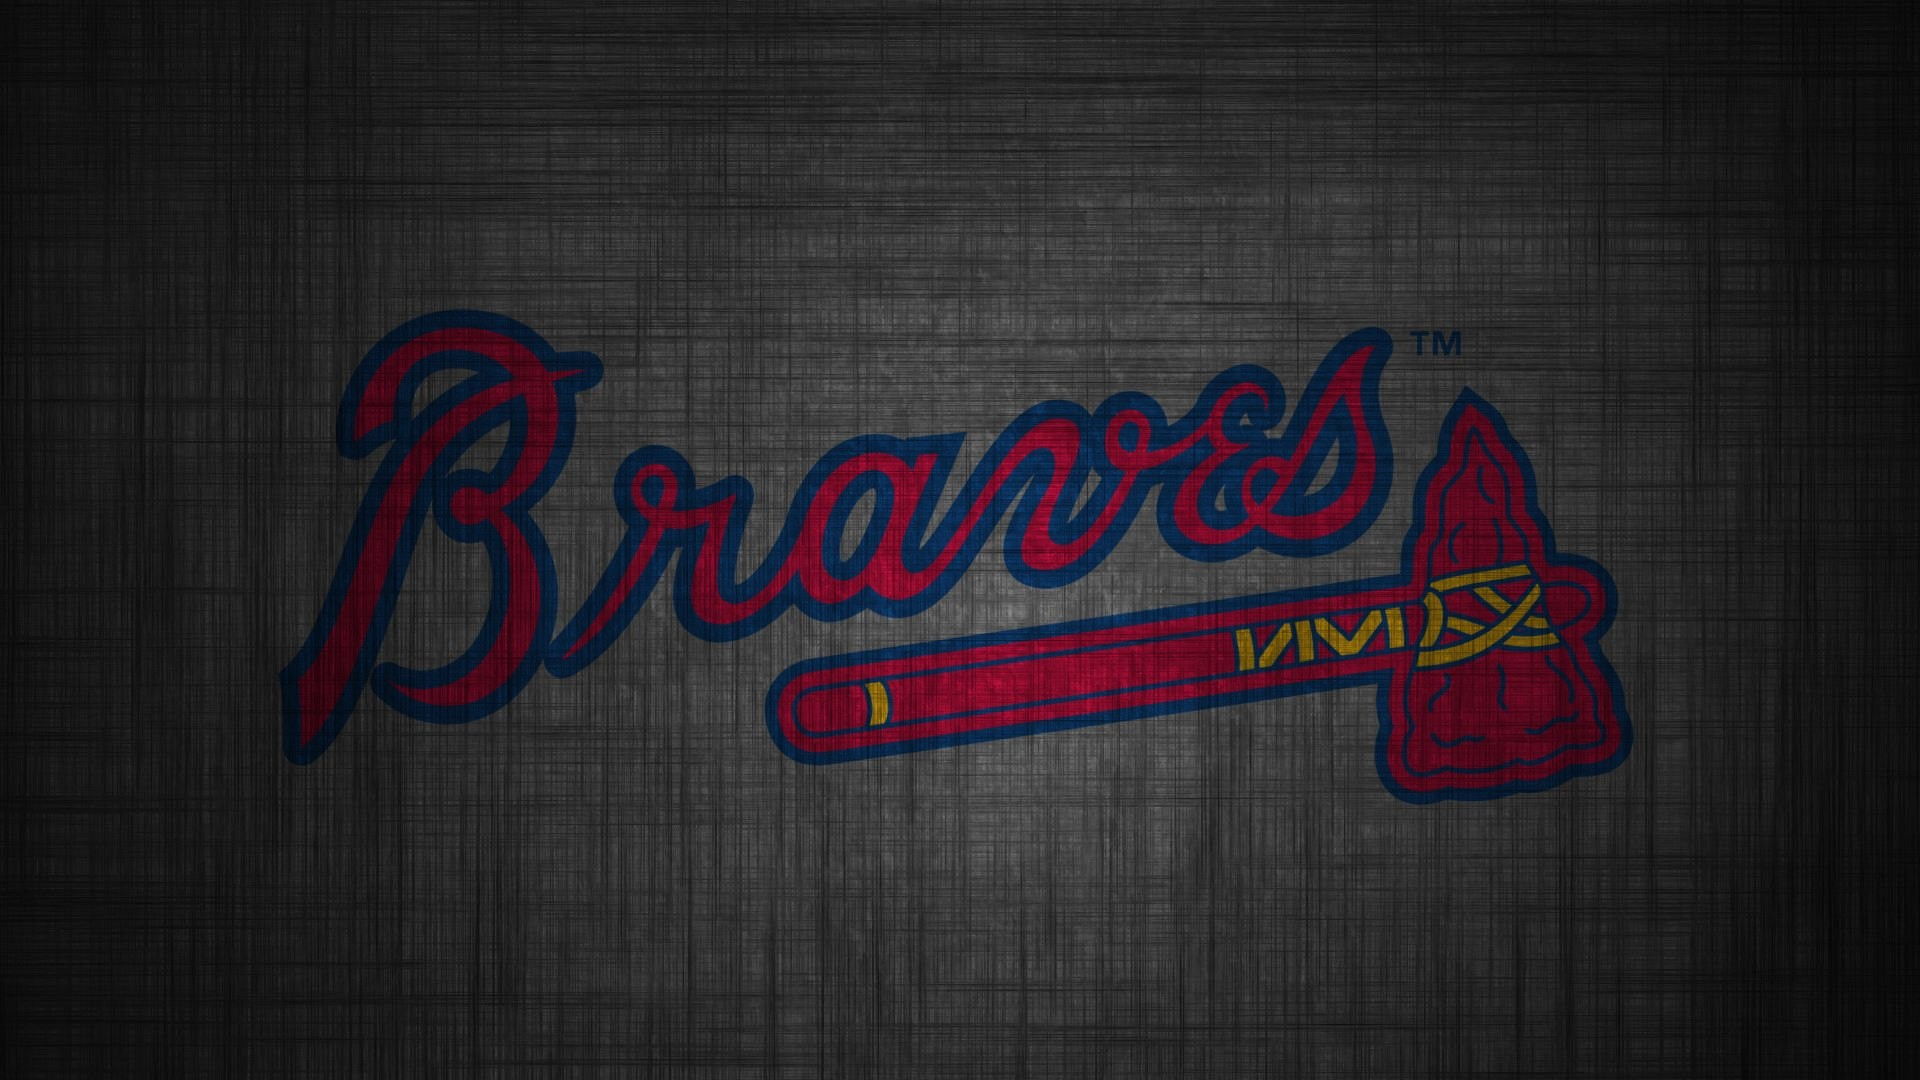 Atlanta Braves HD Wallpaper.